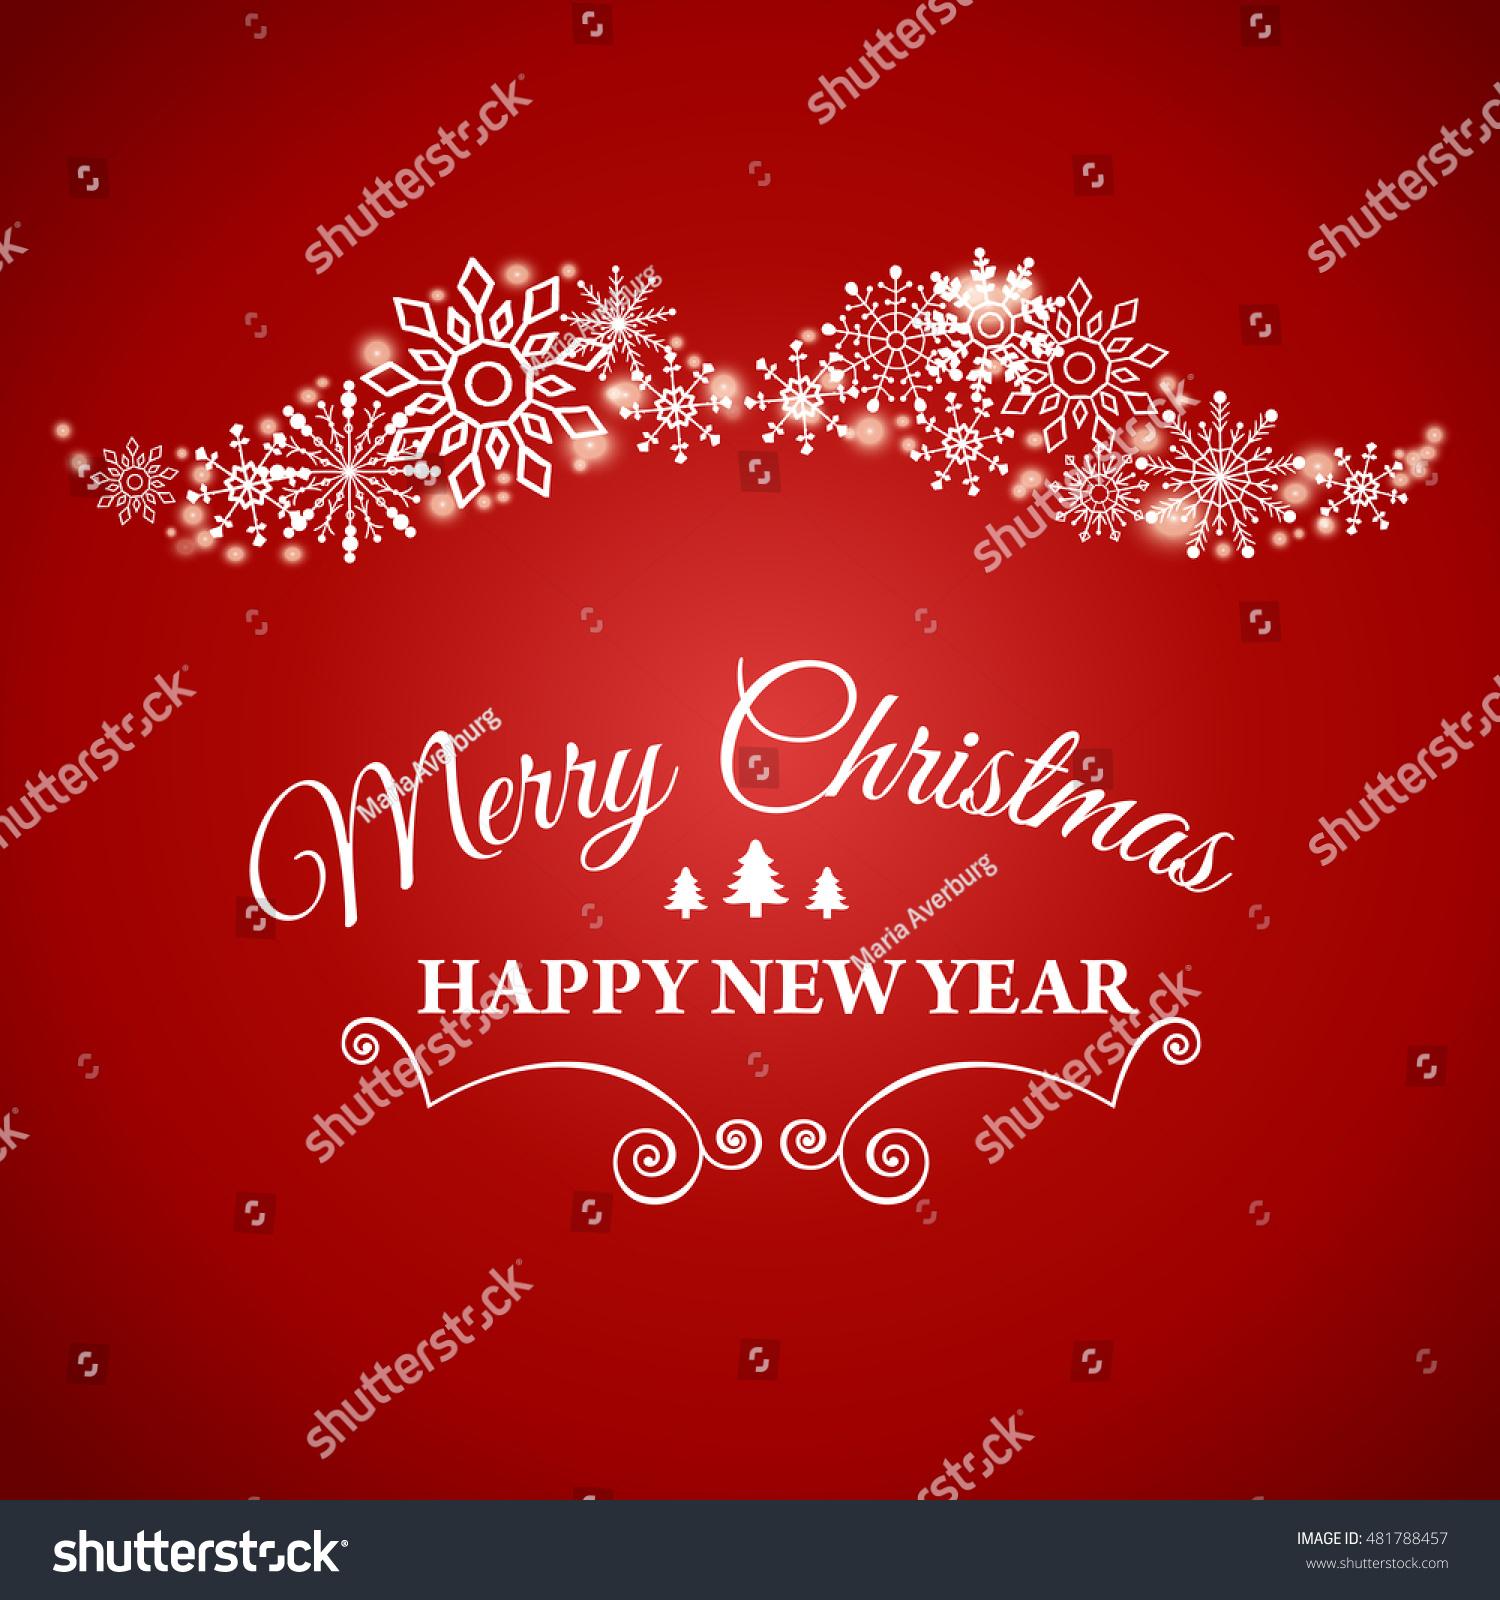 Happy New Year Merry Christmas Ecard Stock Vector (Royalty Free ...